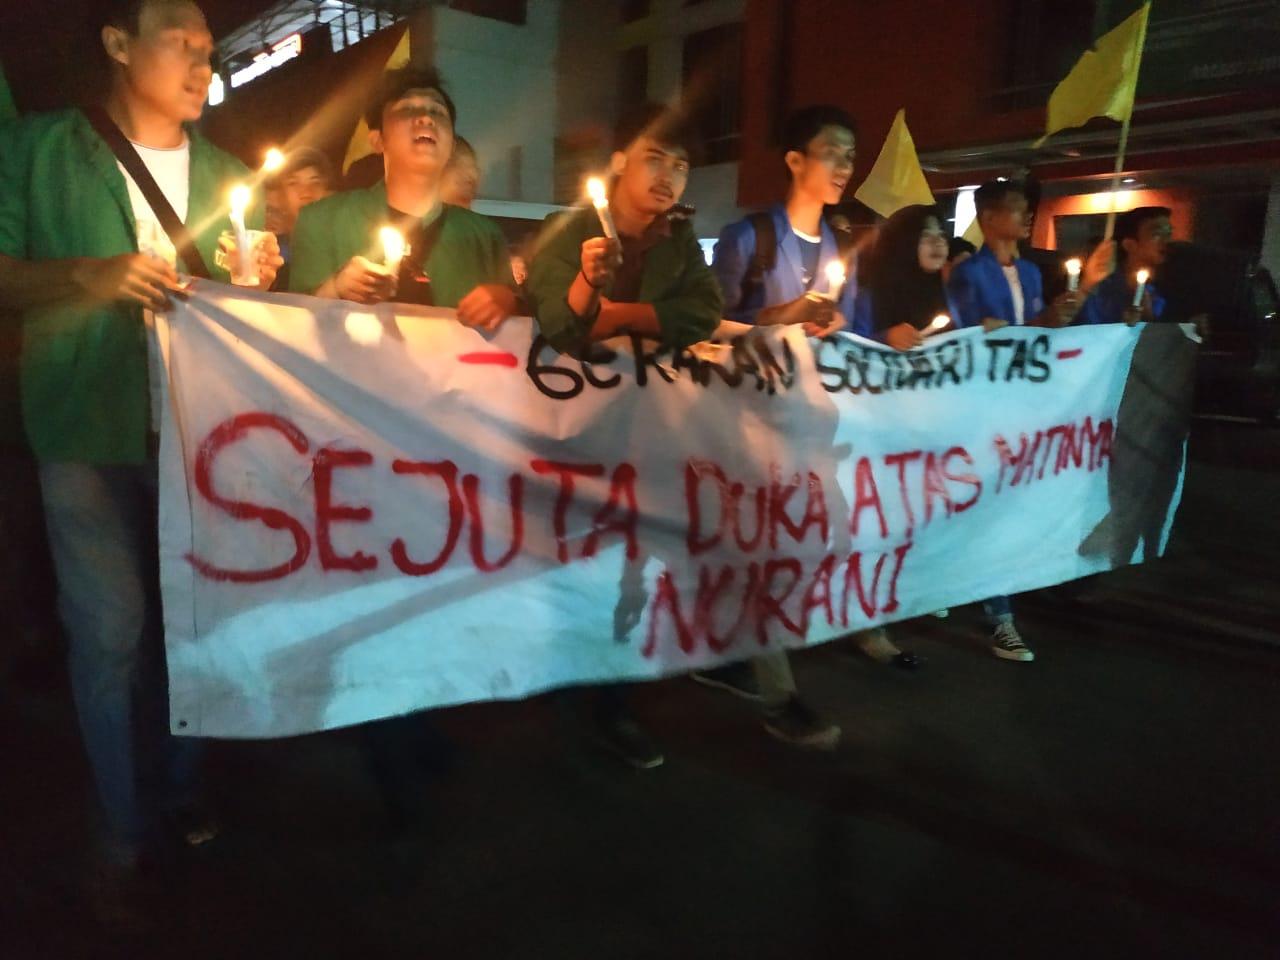 Tuding Kesewenang-wenangan Aparat, Komando Gelar Renungan 'Sejuta Duka Atas Matinya Nurani'